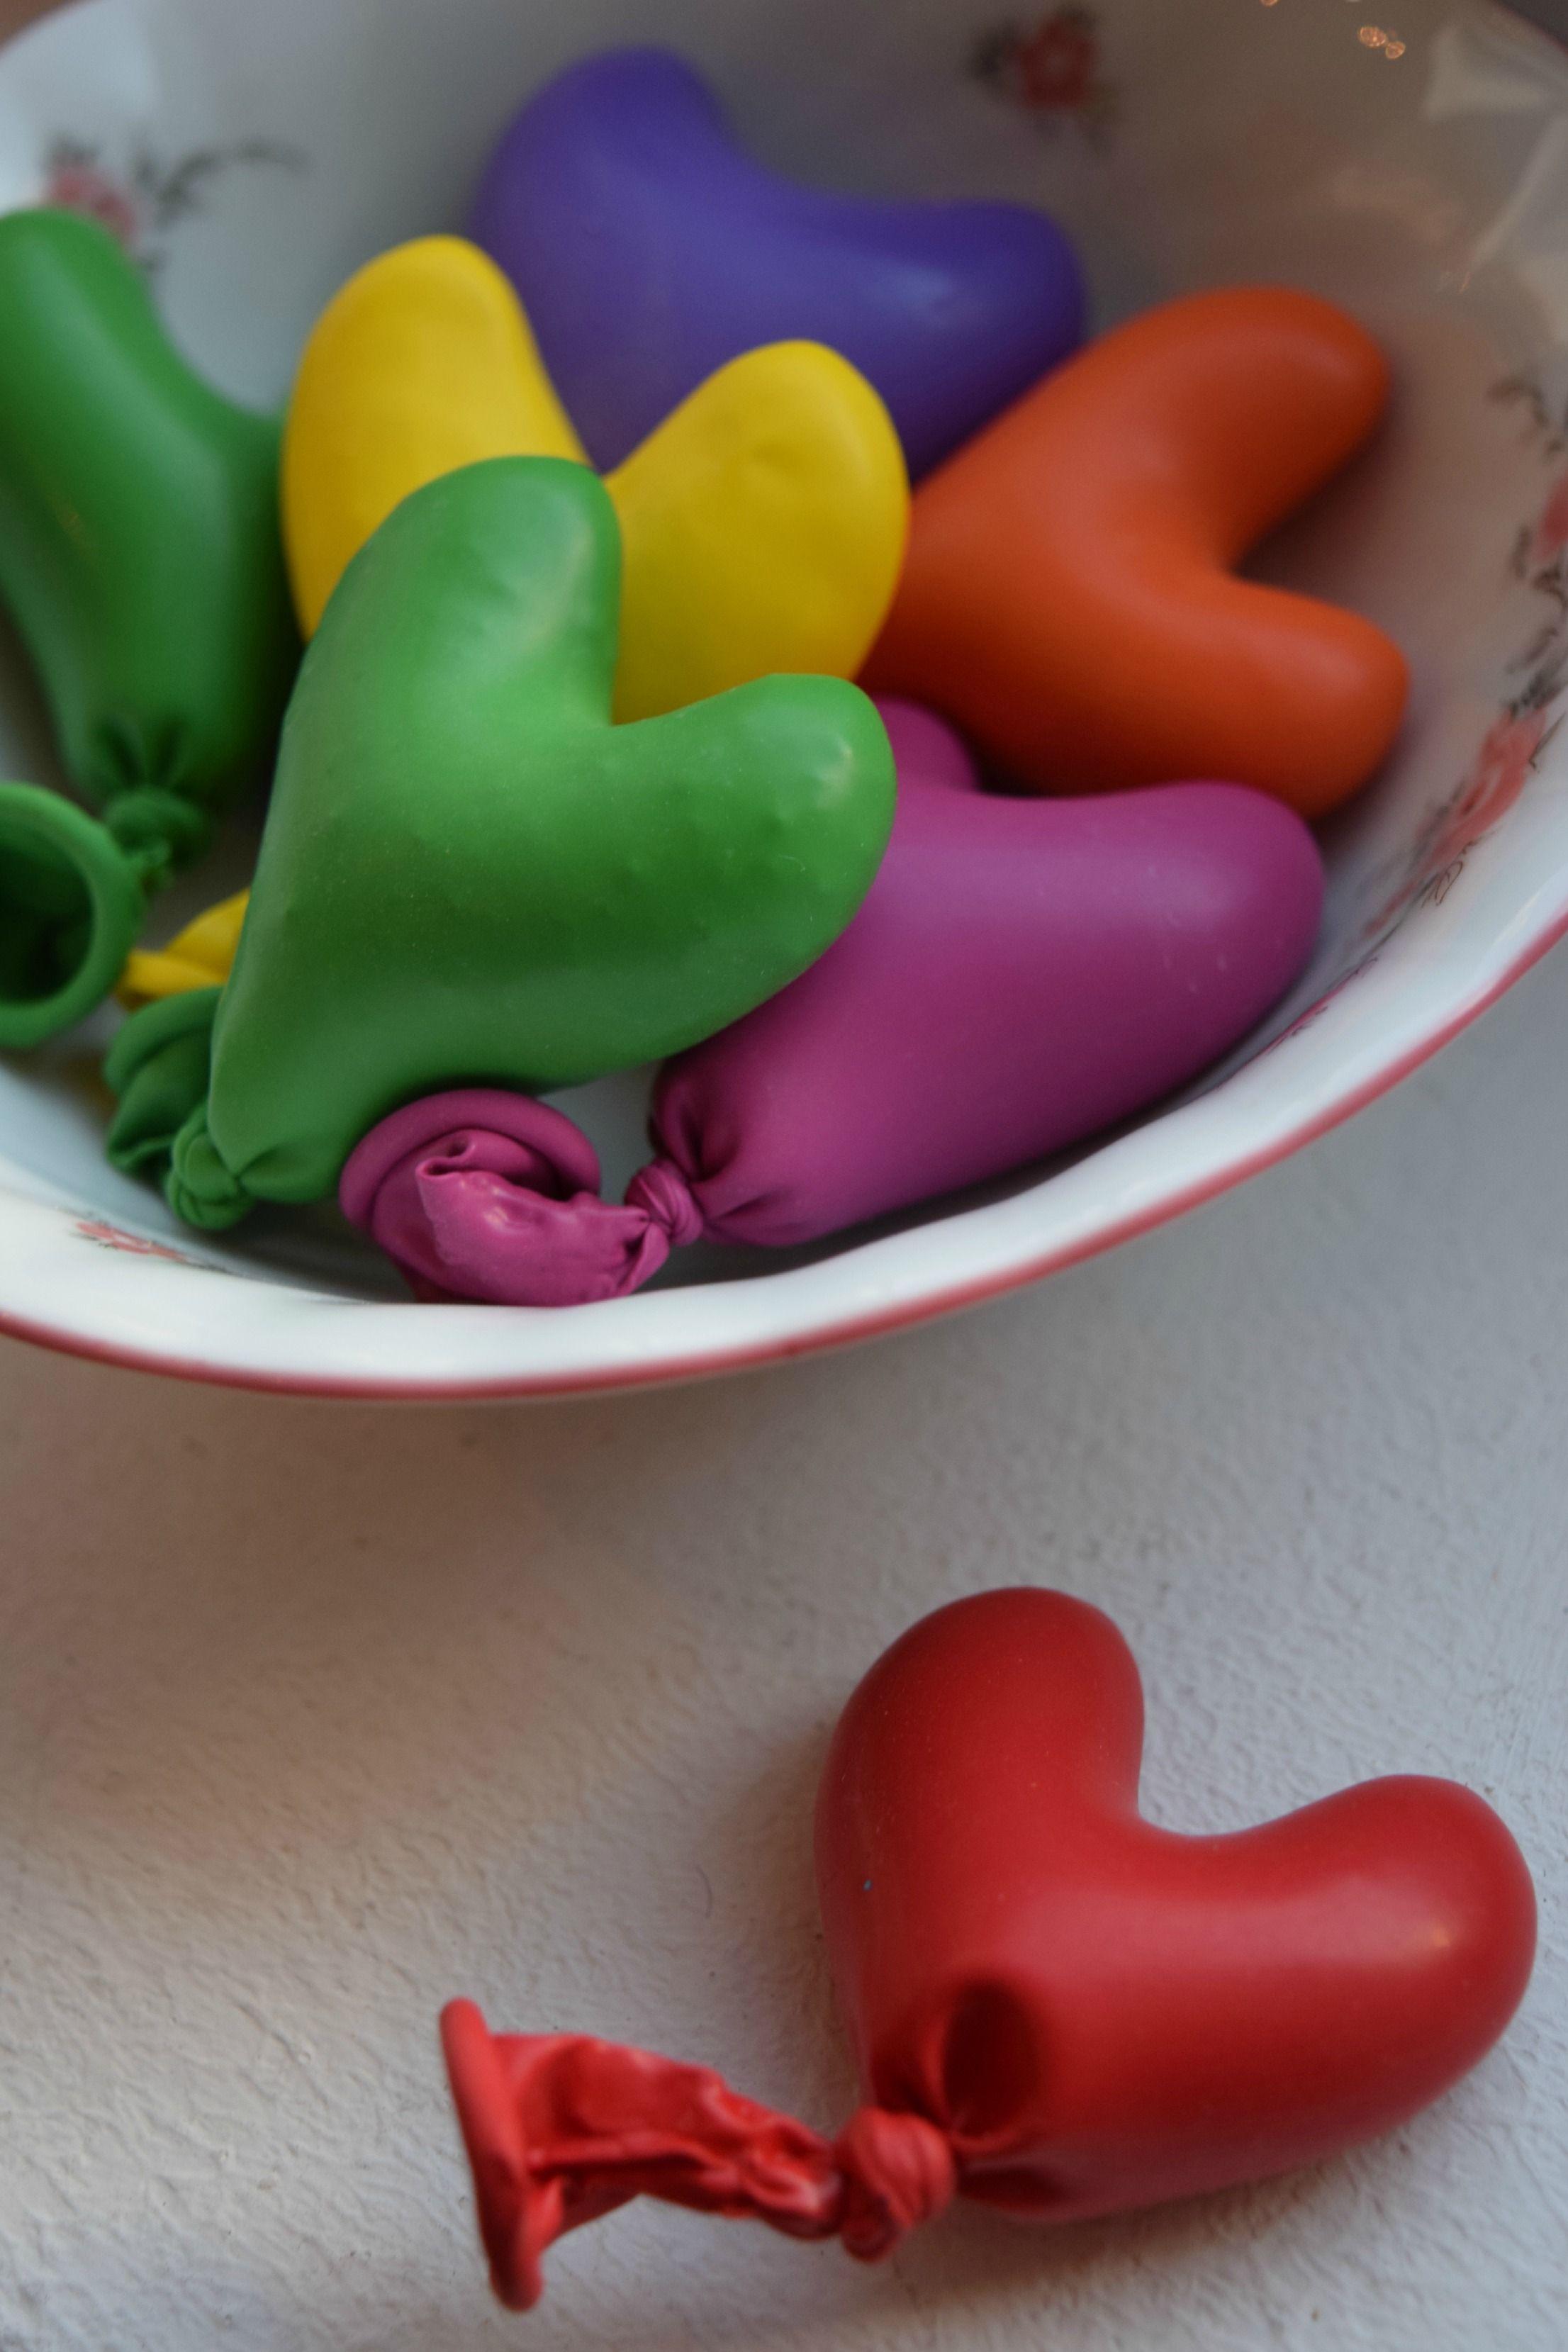 How to Make Mini Stress Toys | Stress toys, Mindfulness ...